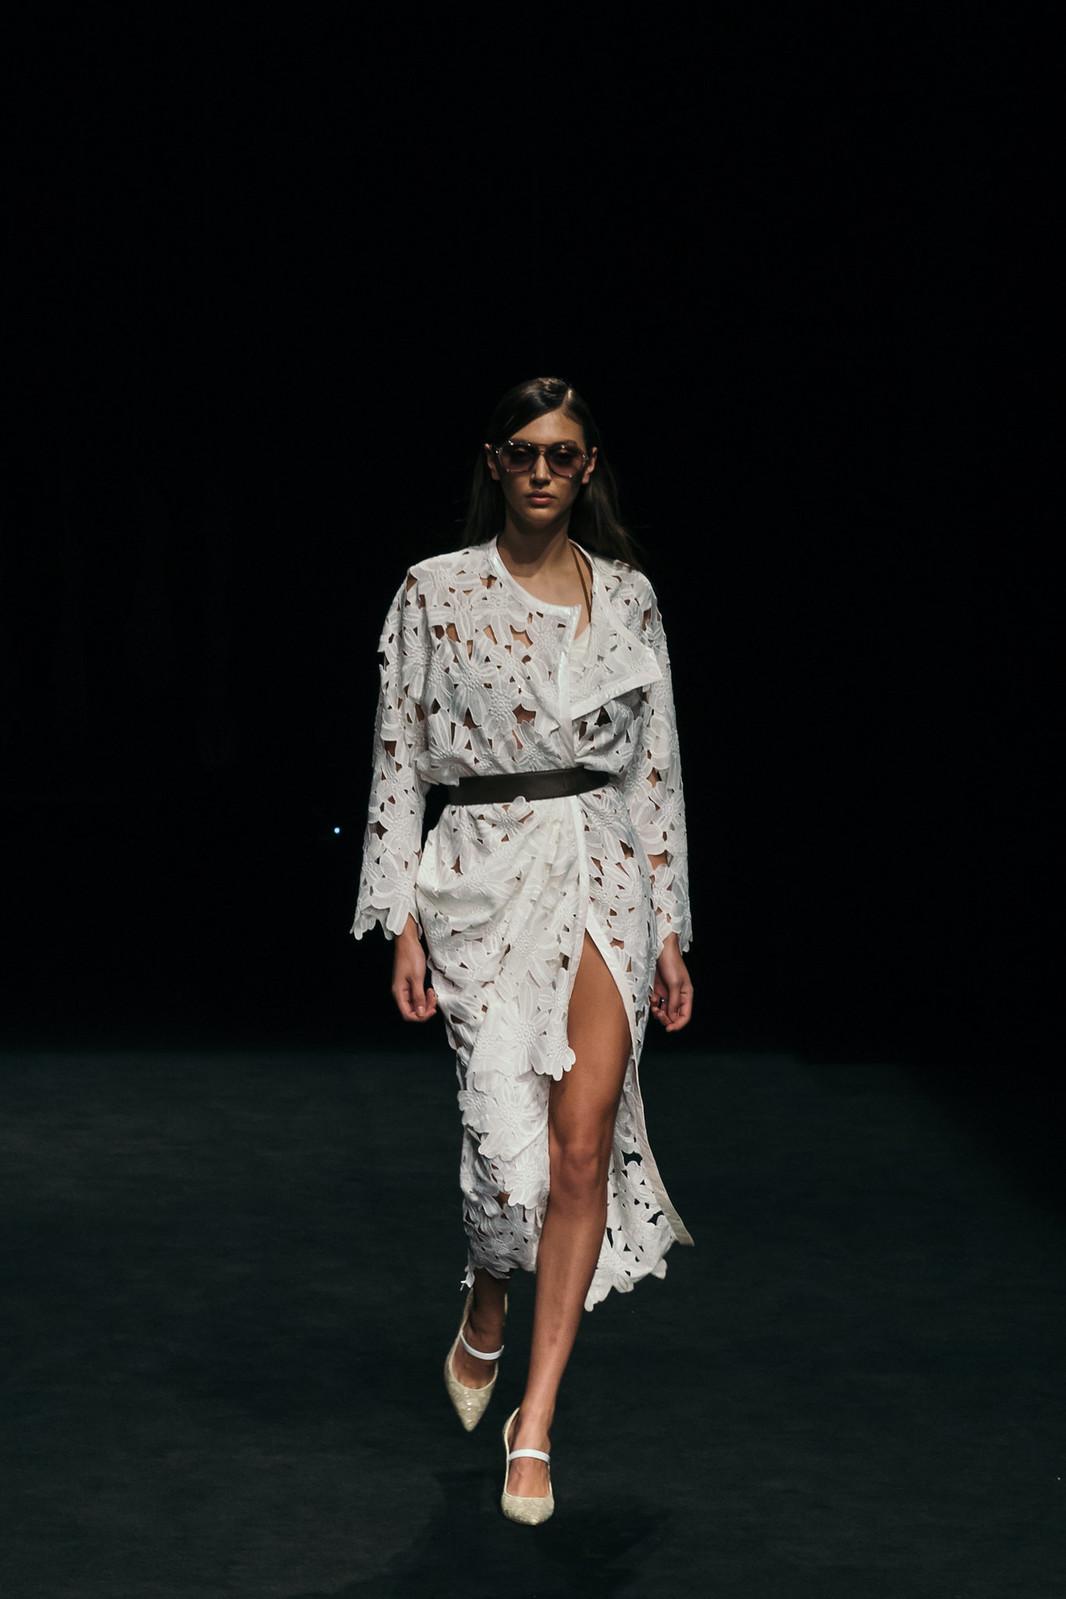 Jessie Chanes - Seams for a desire - 080 Bacelona Fashion #080bcnfasion -9